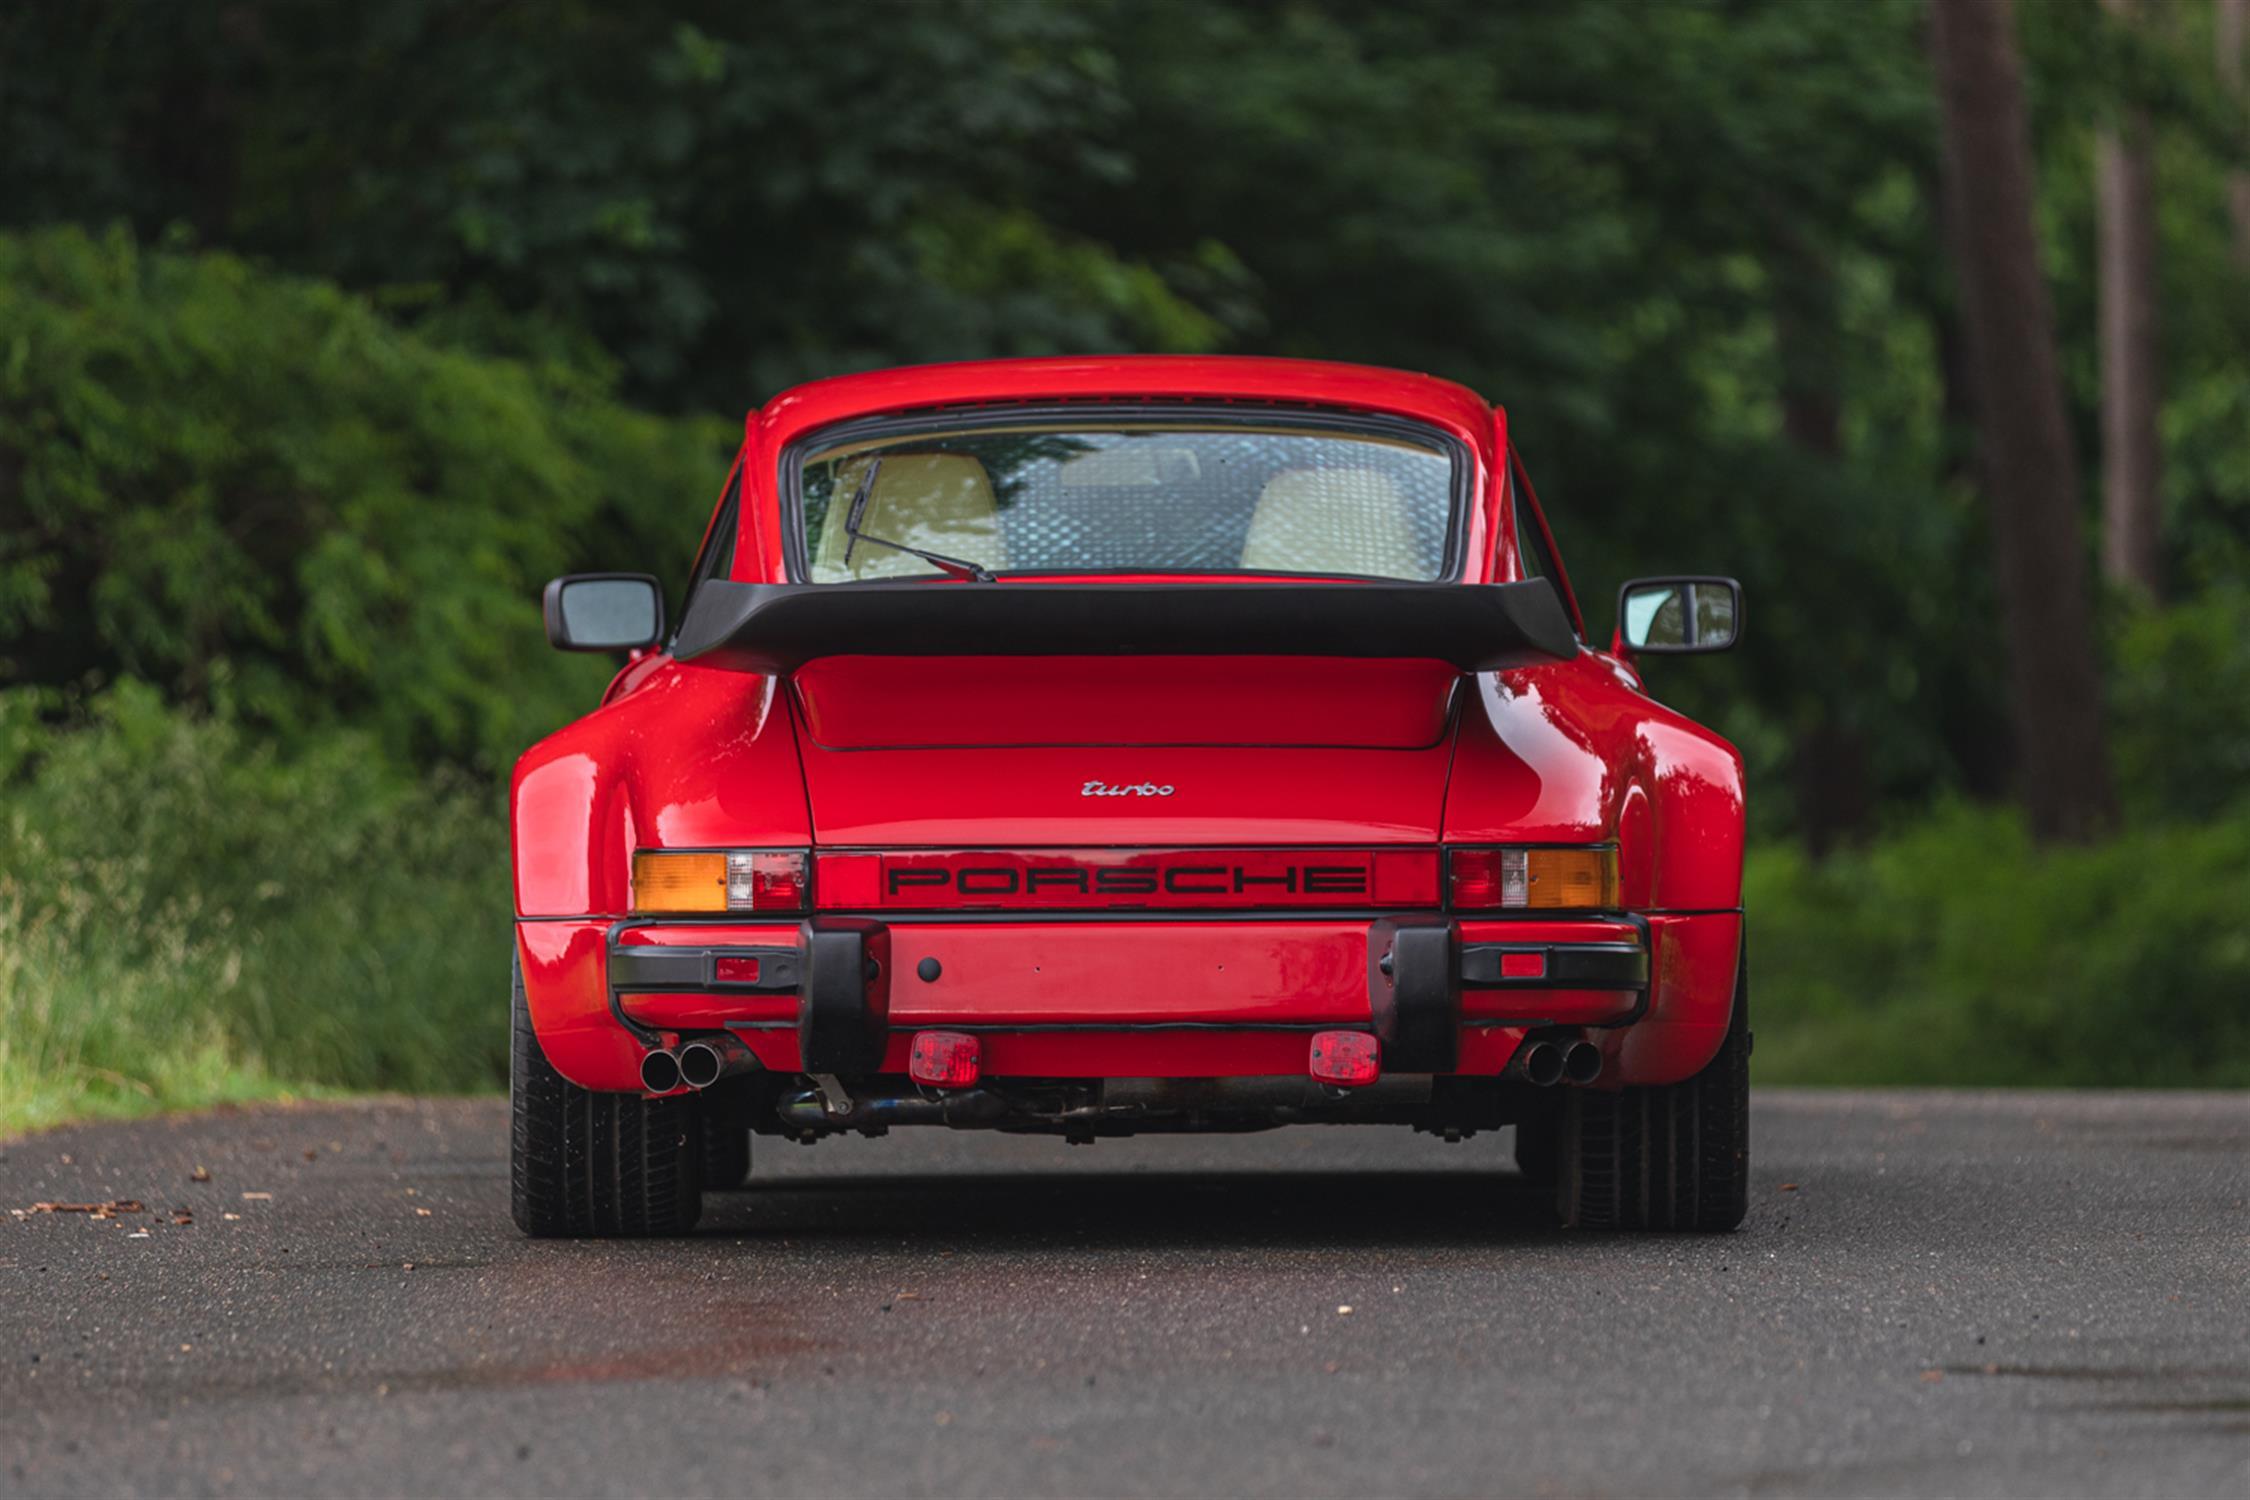 1986 Porsche 911 (930) Turbo SE 'Flatnose' - Image 7 of 10